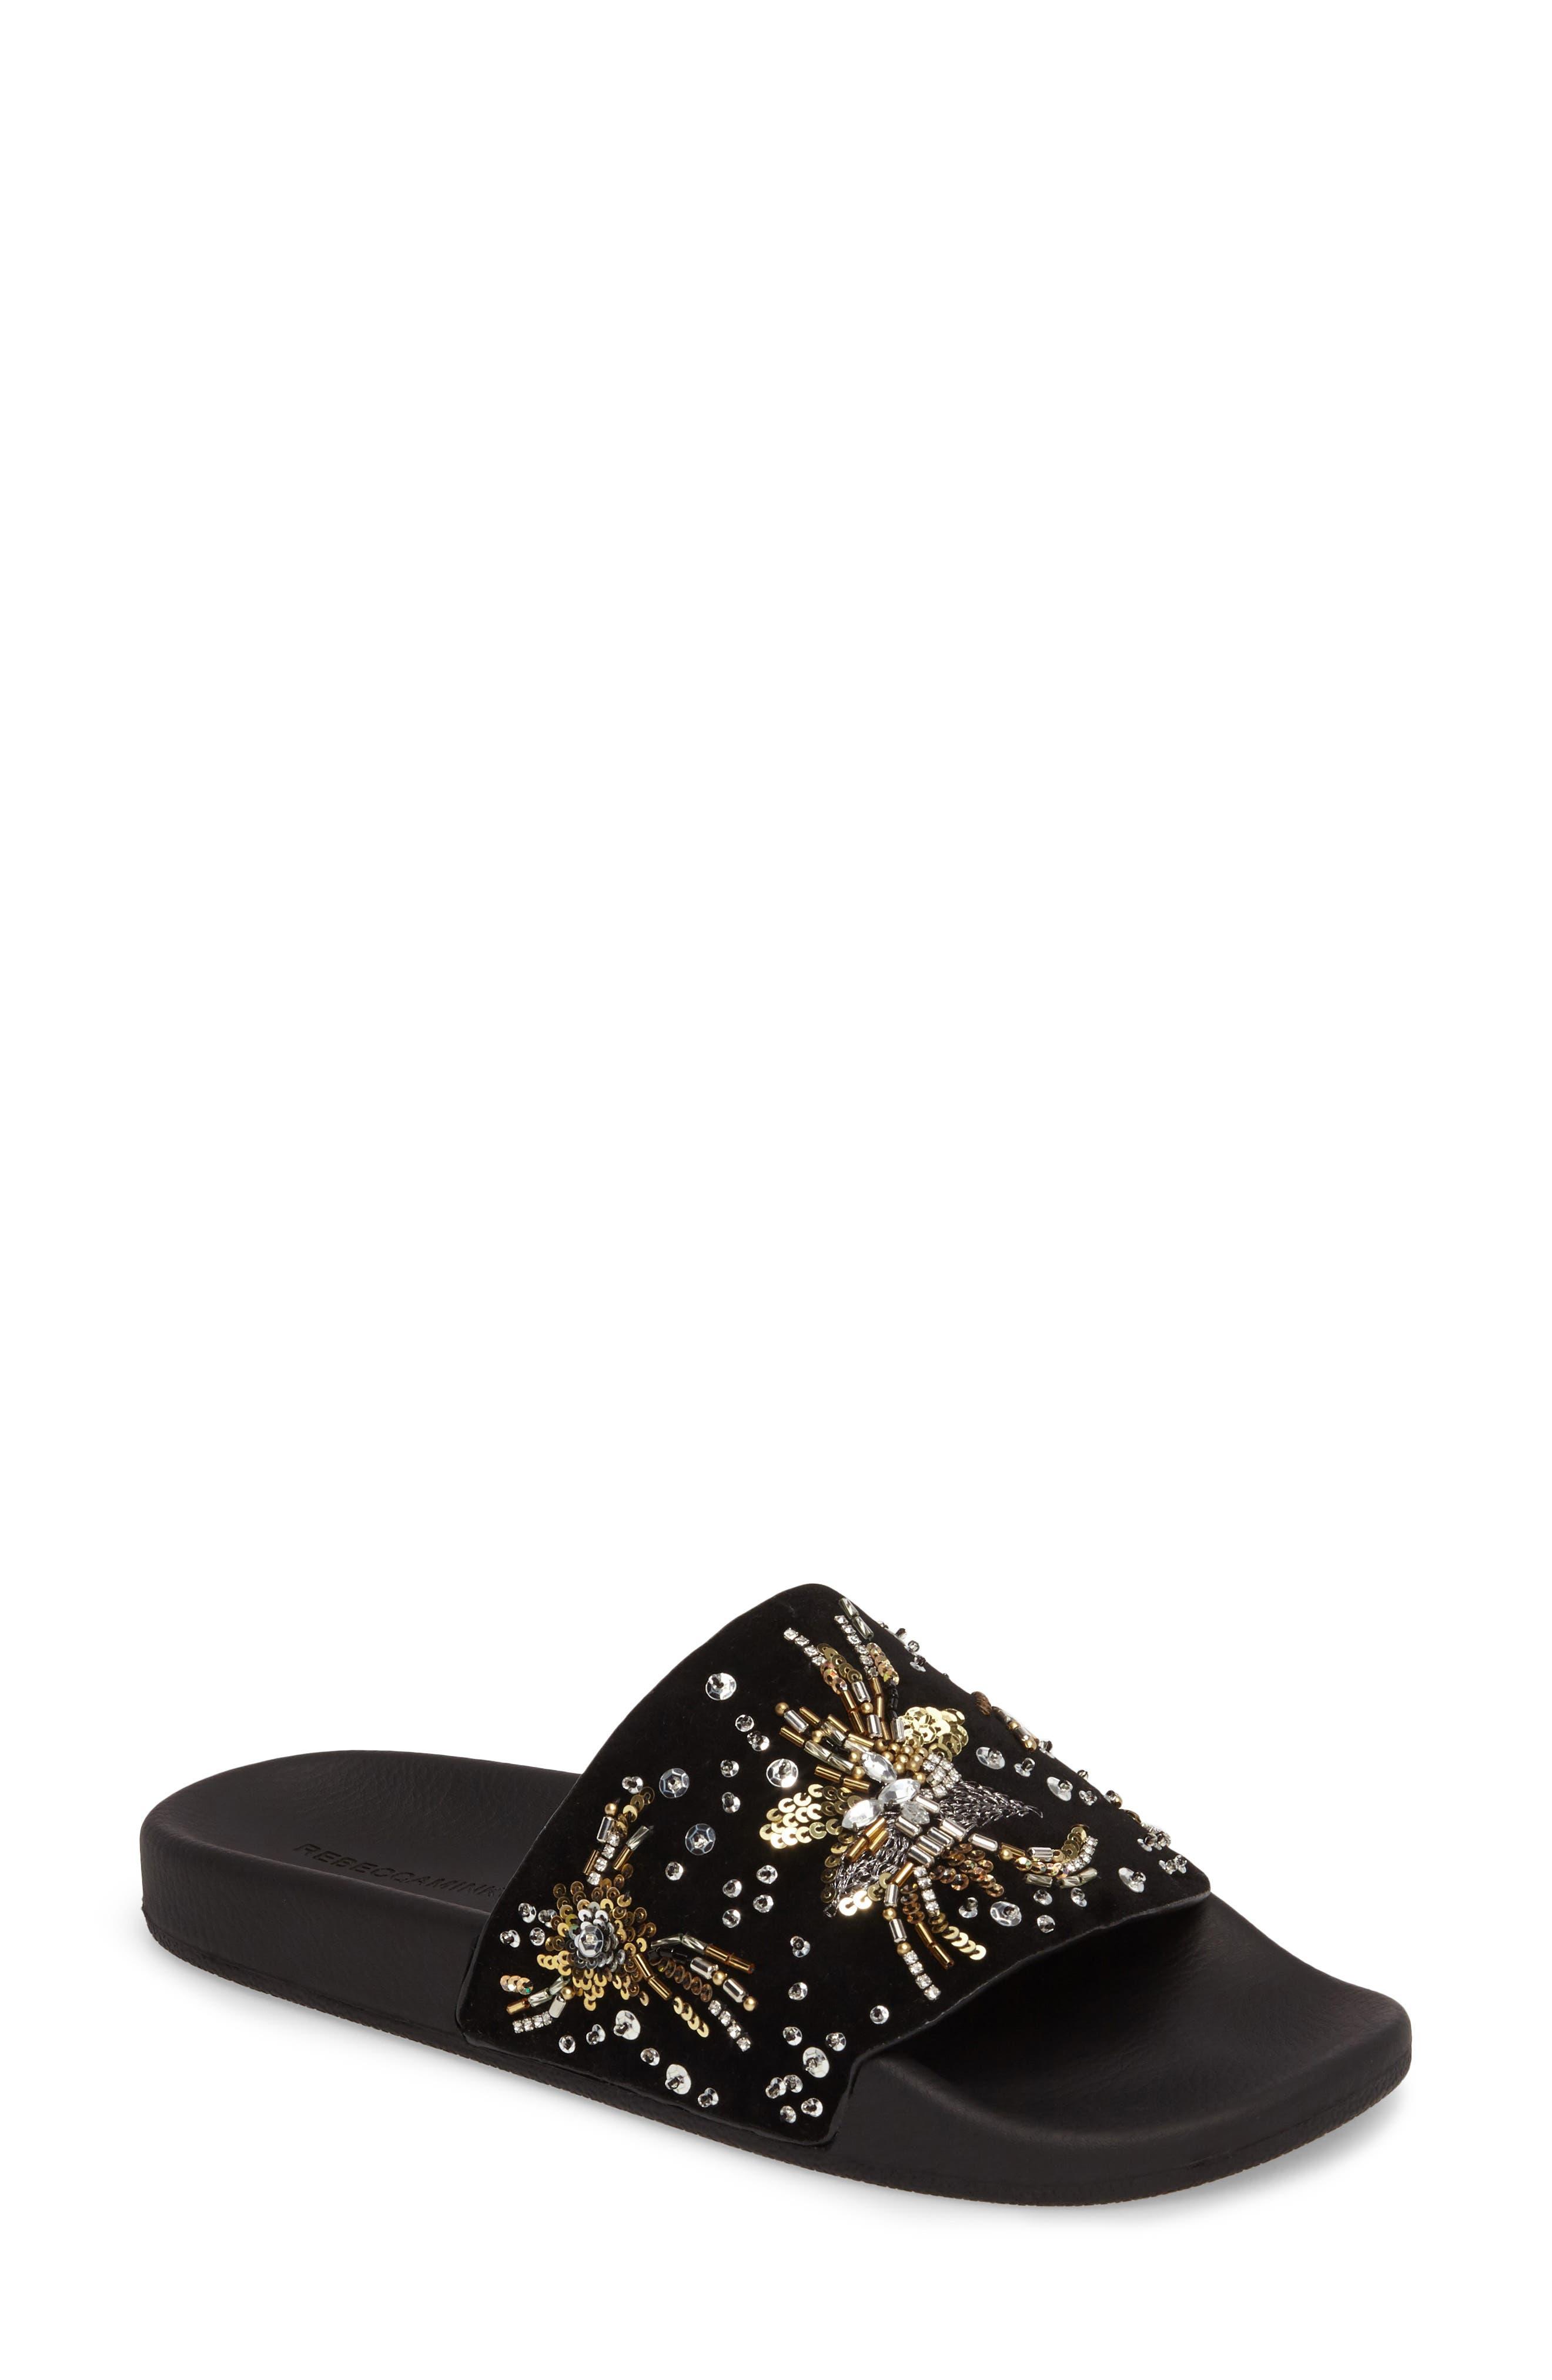 REBECCA MINKOFF Suzette Slide Sandal